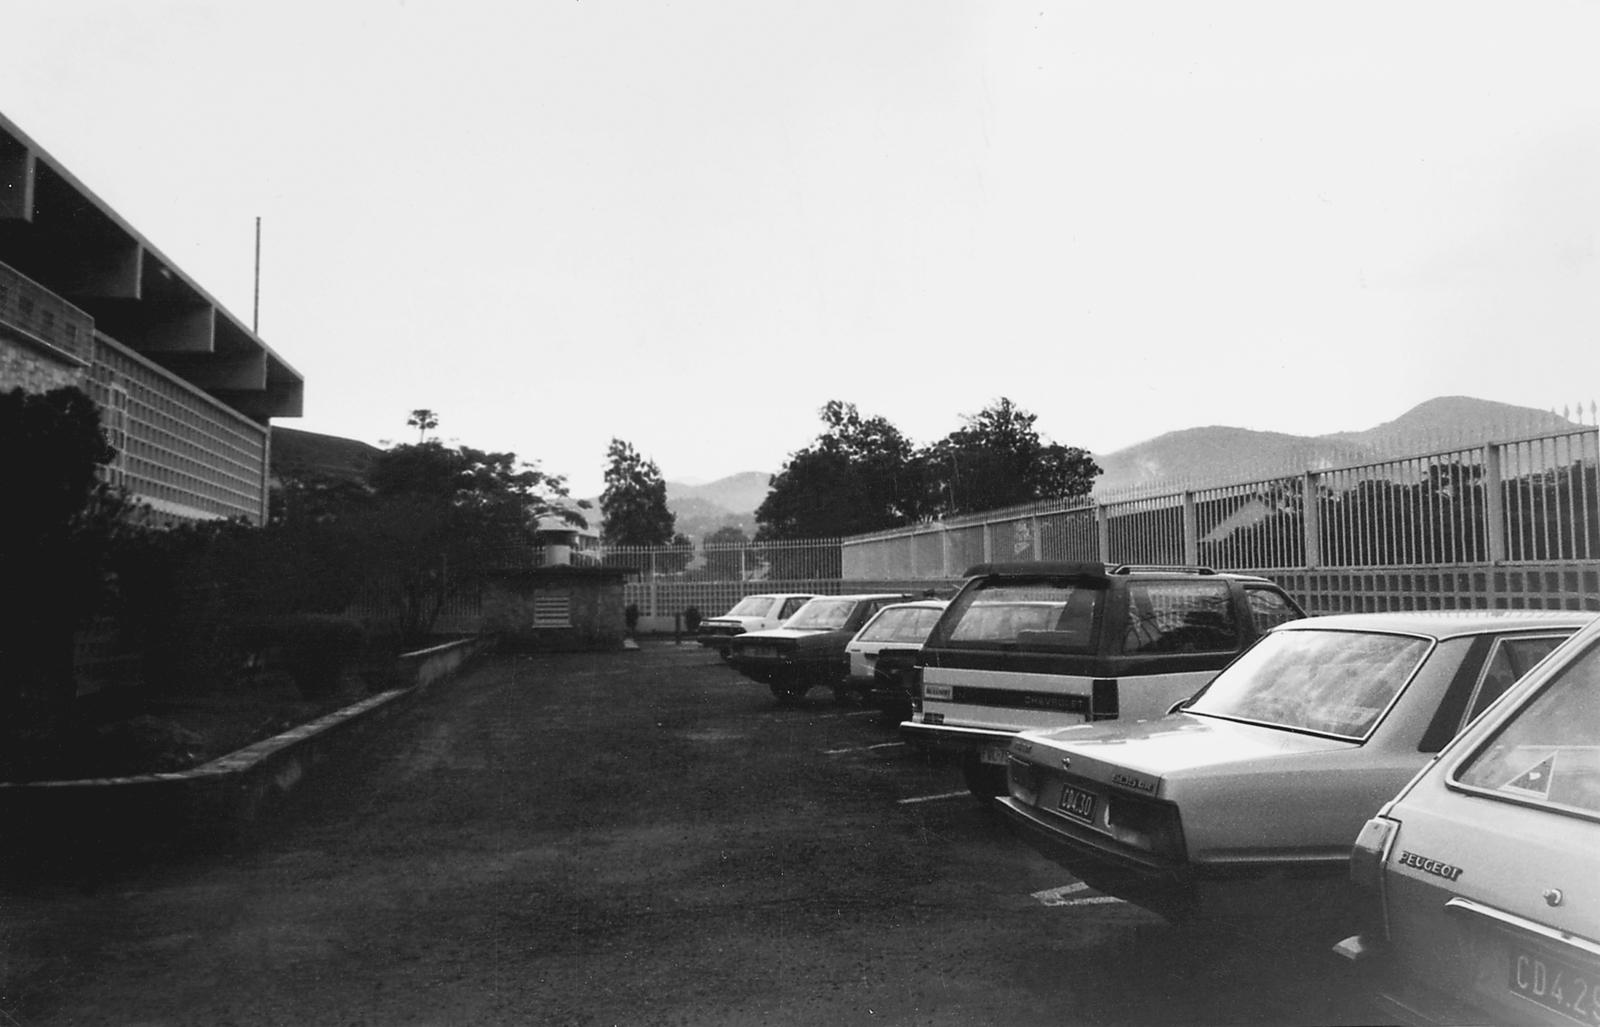 Bujumbura - Standard Level Position Residence - 1980